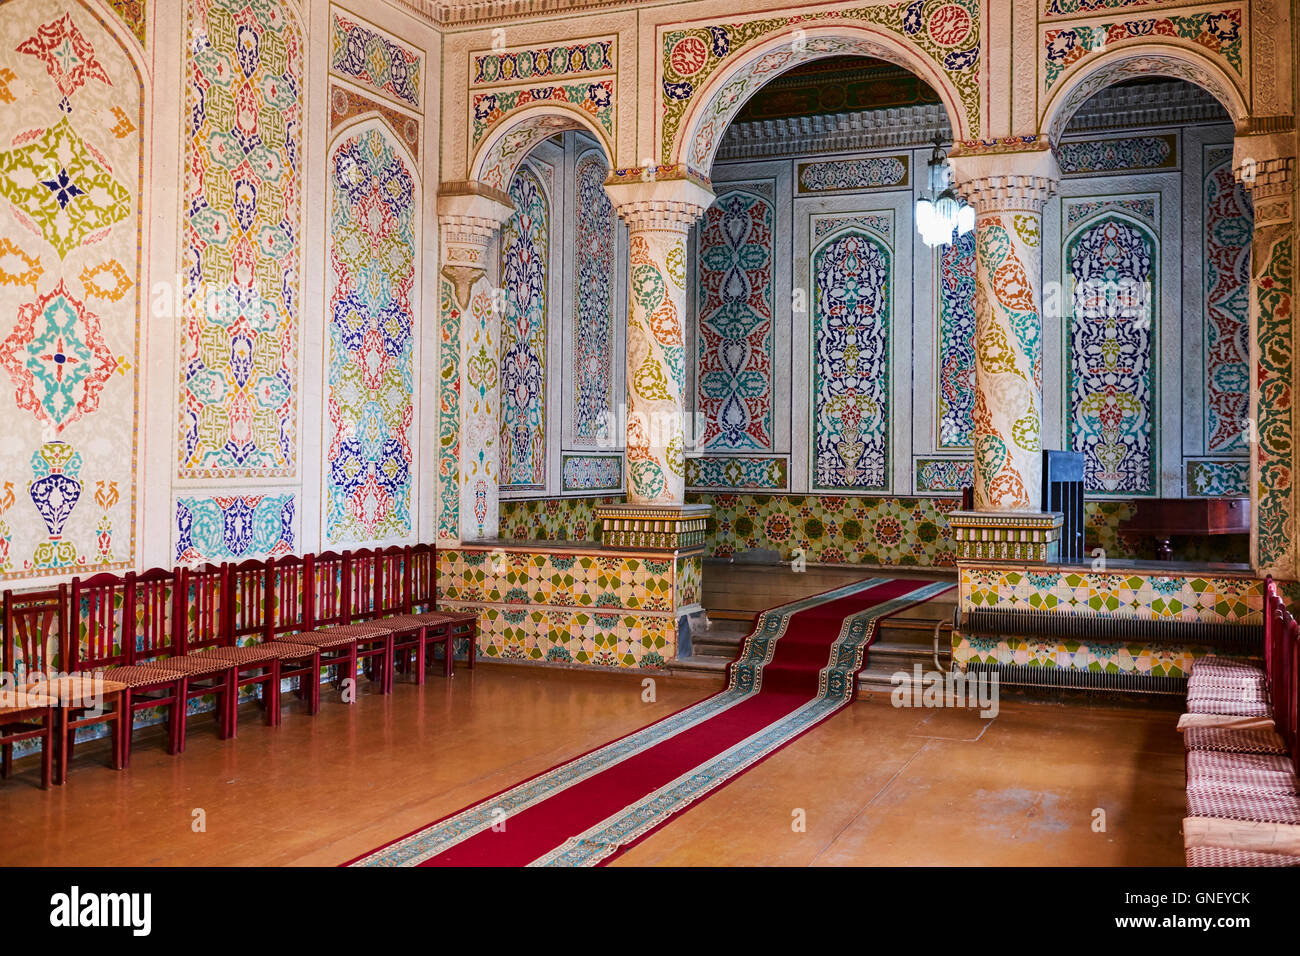 Usbekistan, Samarkand, Unesco Welterbe, Samarkand Regional Museum der Heimatkunde, jüdisches Museum, Präsidentenresidenz Stockbild